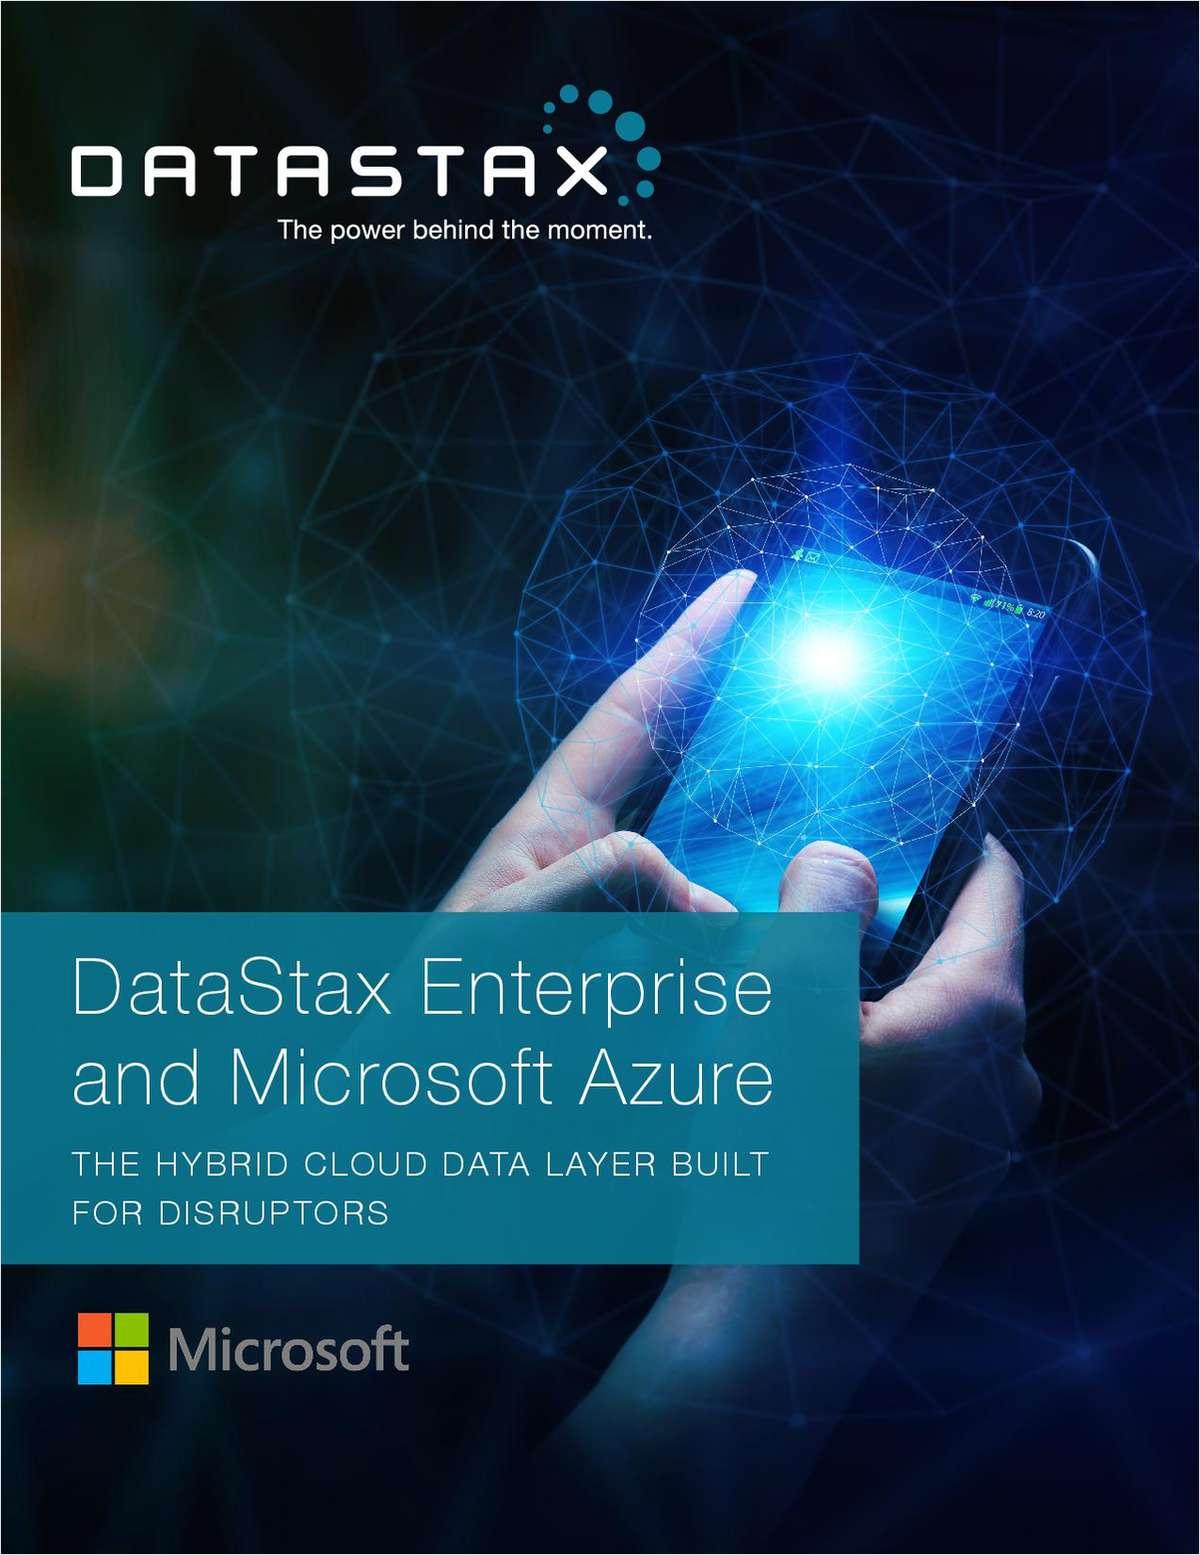 DataStax Enterprise and Microsoft Azure: The Hybrid Cloud Data Layer Built for Disruptors